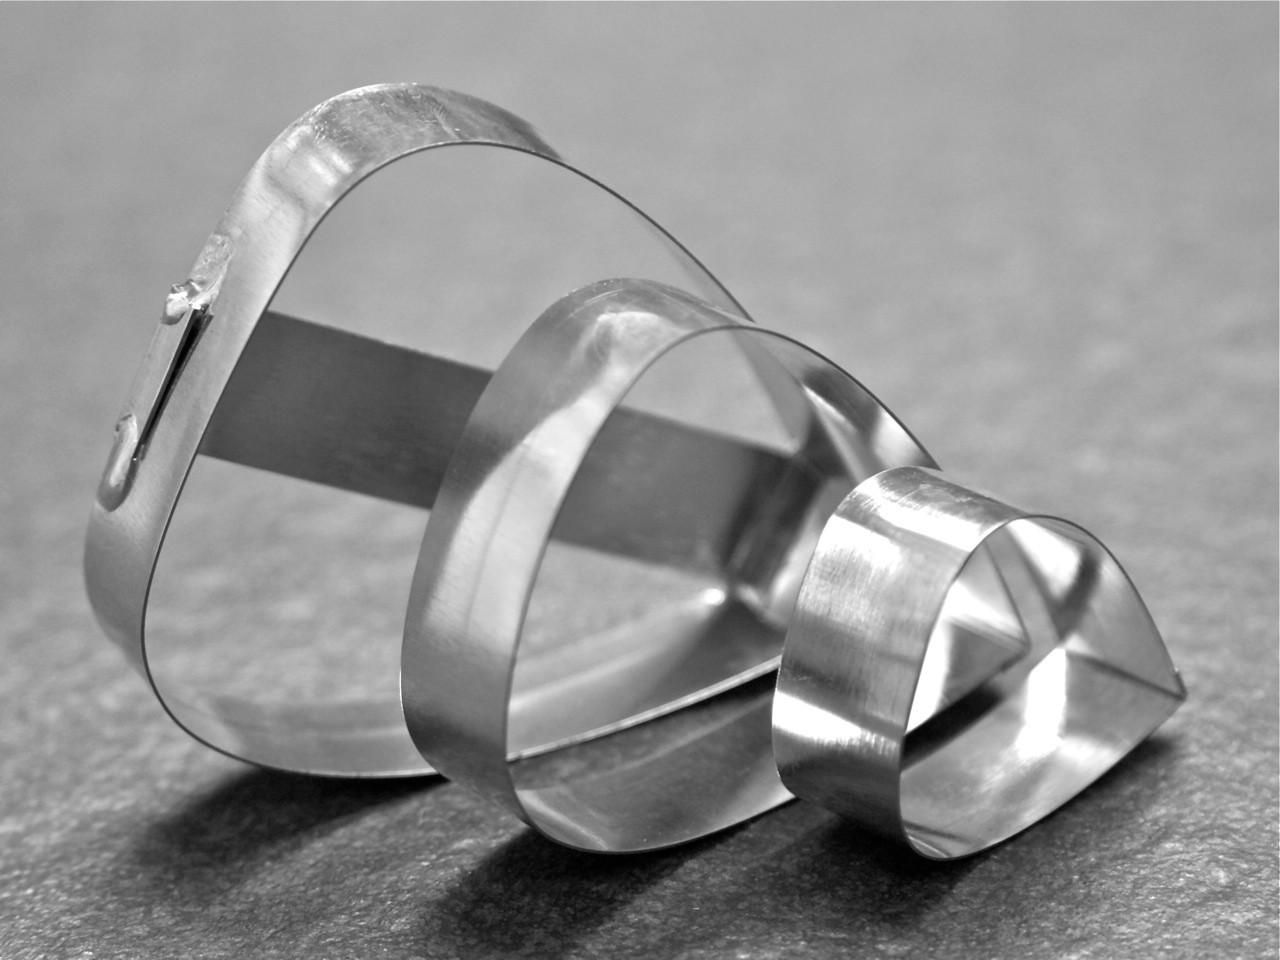 Cutters - Shields - Set of 3